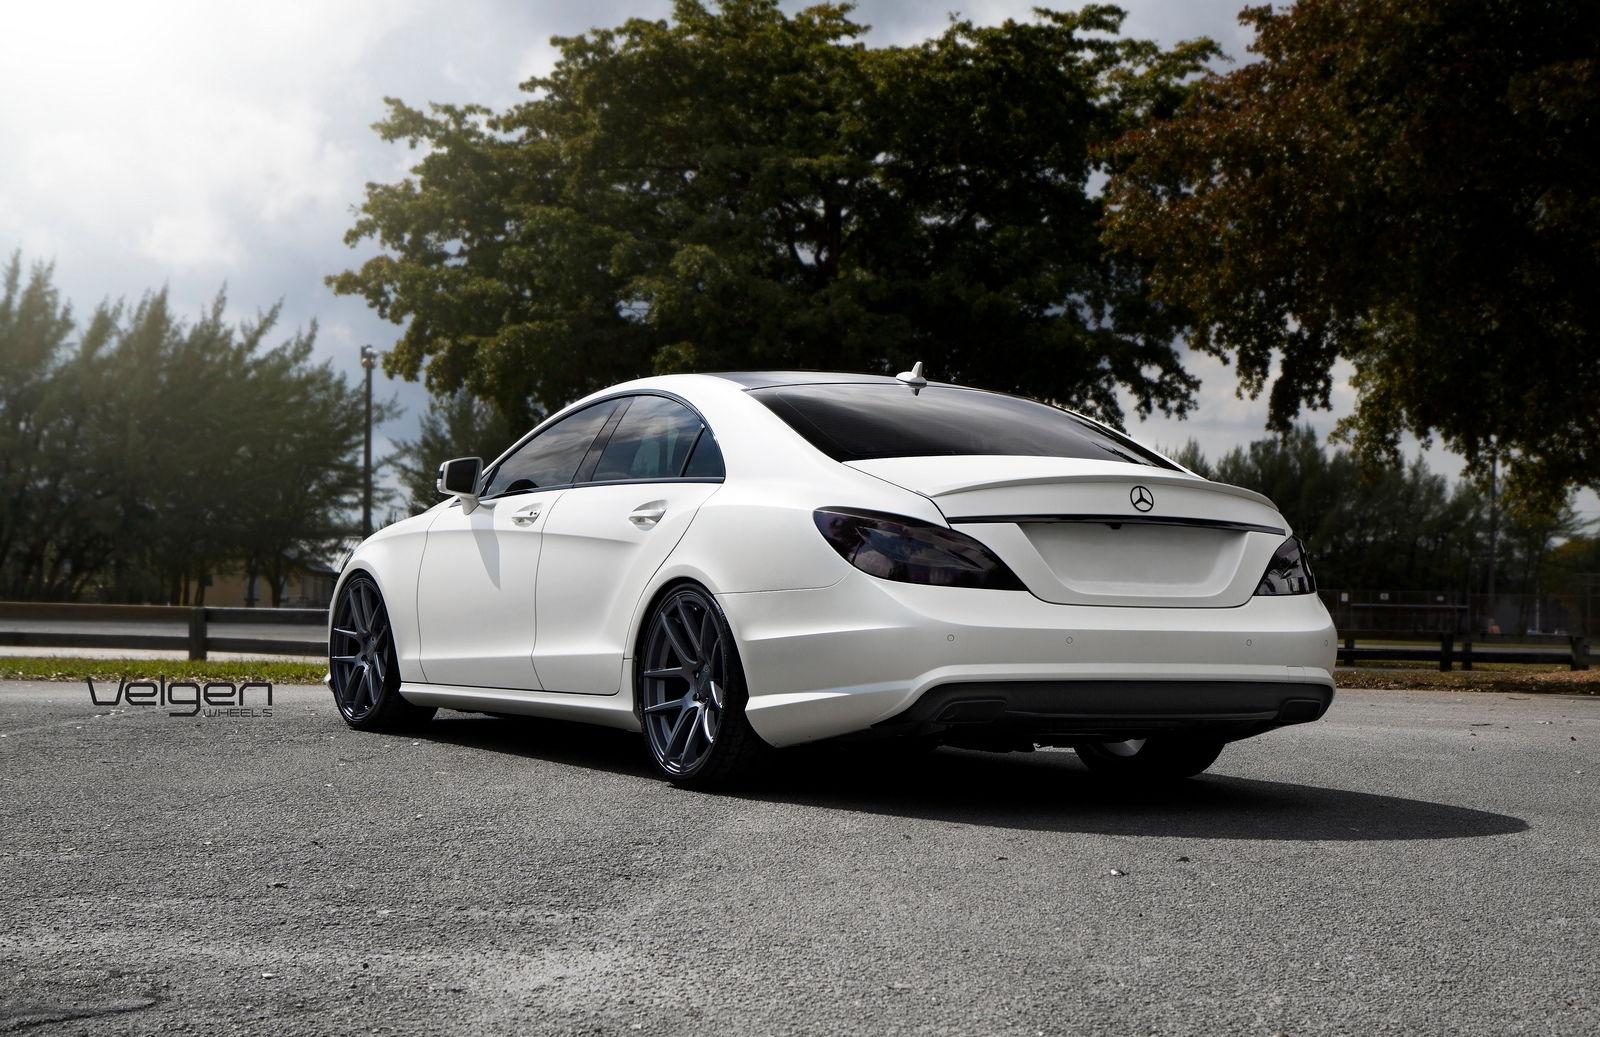 Mercedes benz cls550 on velgen wheels 6speedonline for Mercedes benz cls 550 amg